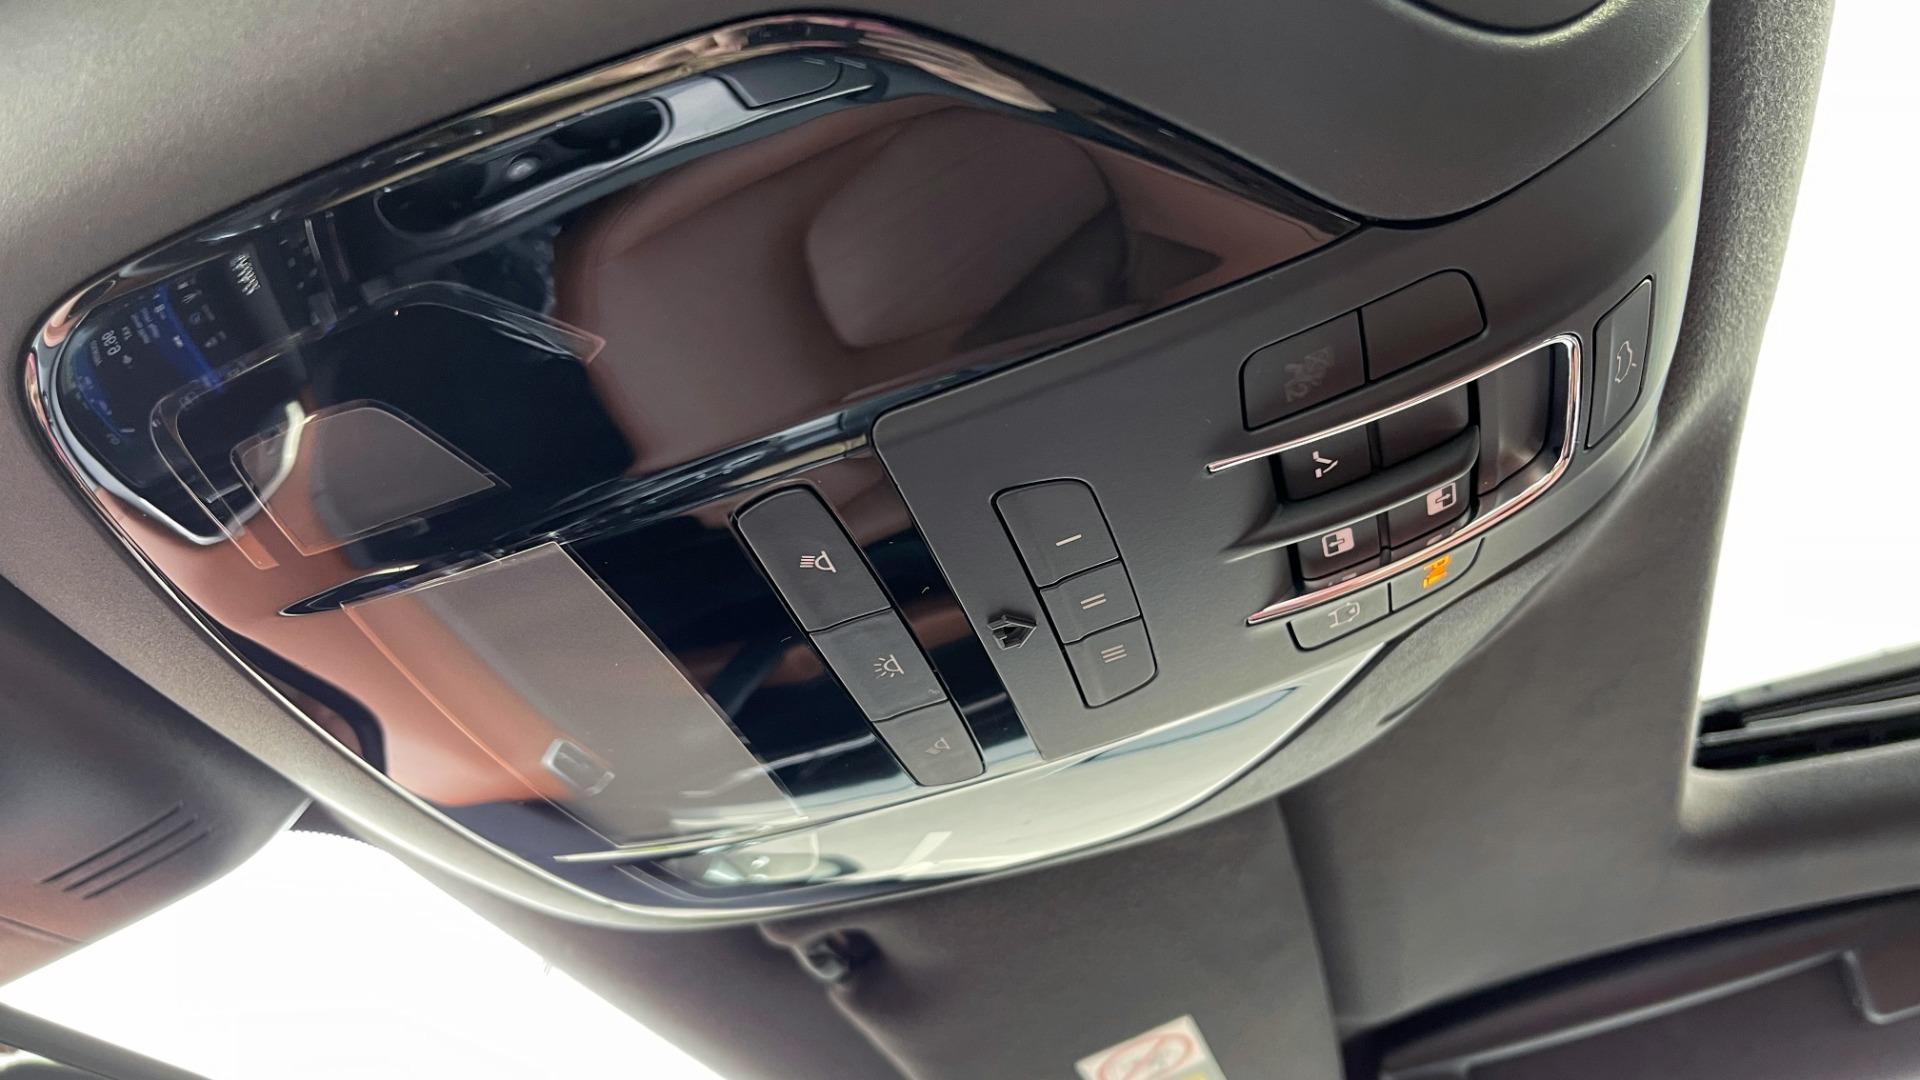 Used 2018 Maserati GHIBLI 3.0L SEDAN / 8-SPD AUTO / NAV / SUNROOF / REARVIEW for sale $42,995 at Formula Imports in Charlotte NC 28227 42